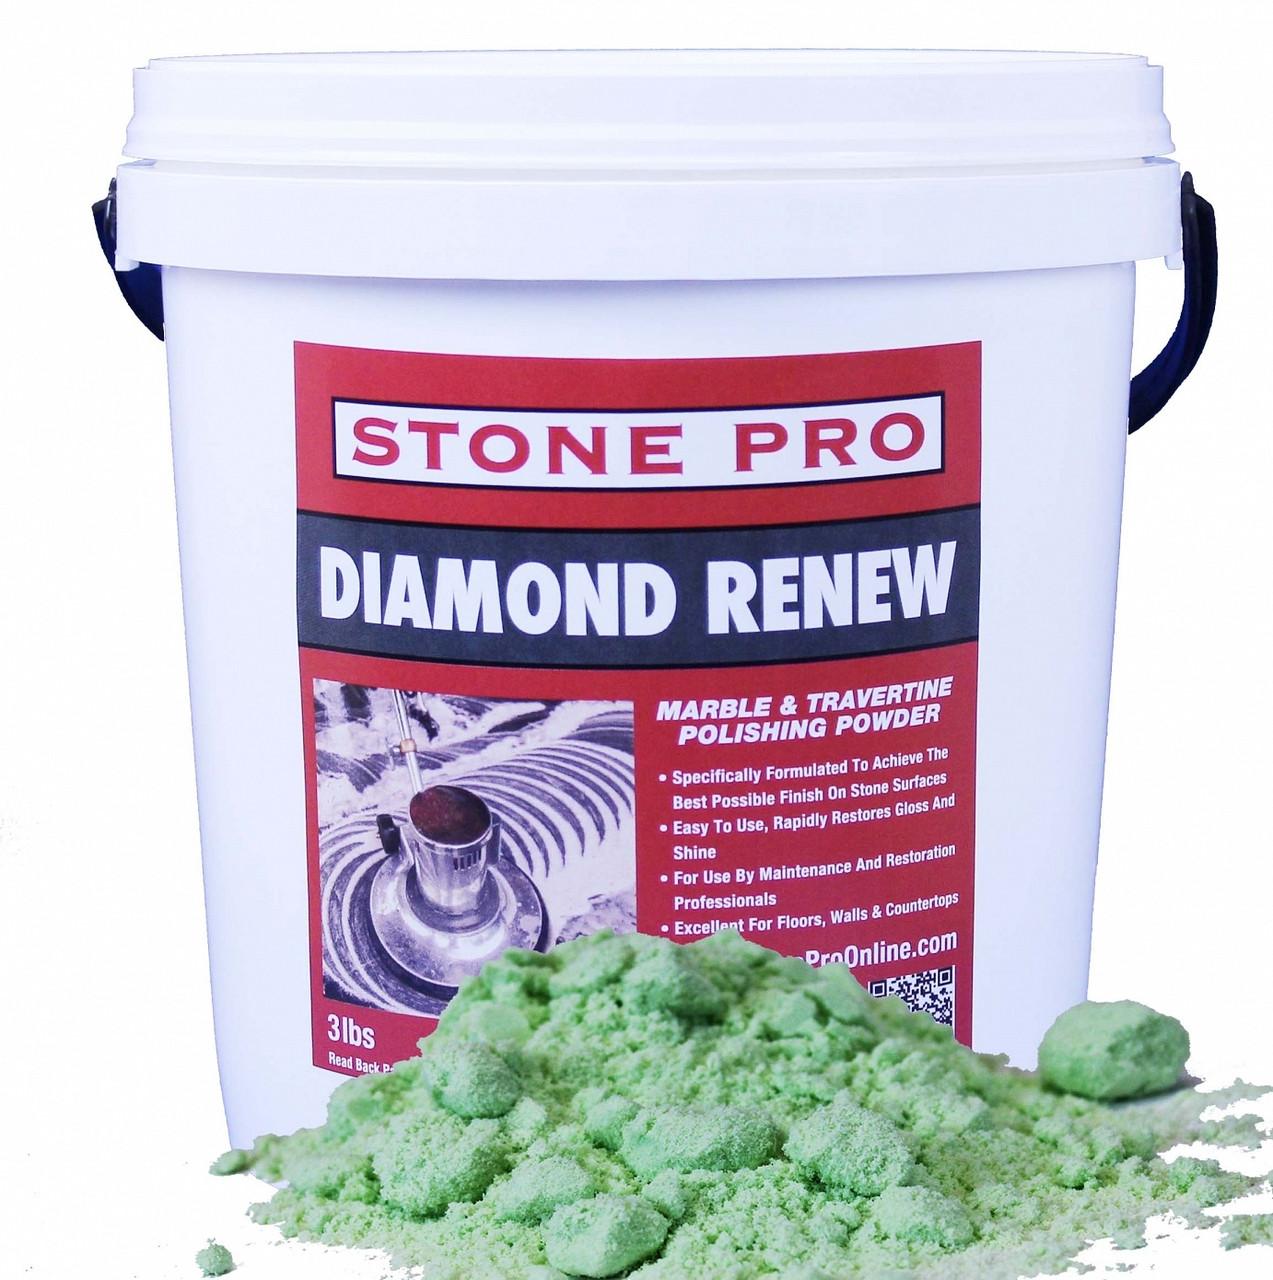 Stone Pro Diamond Renew – Marble Polishing Powder